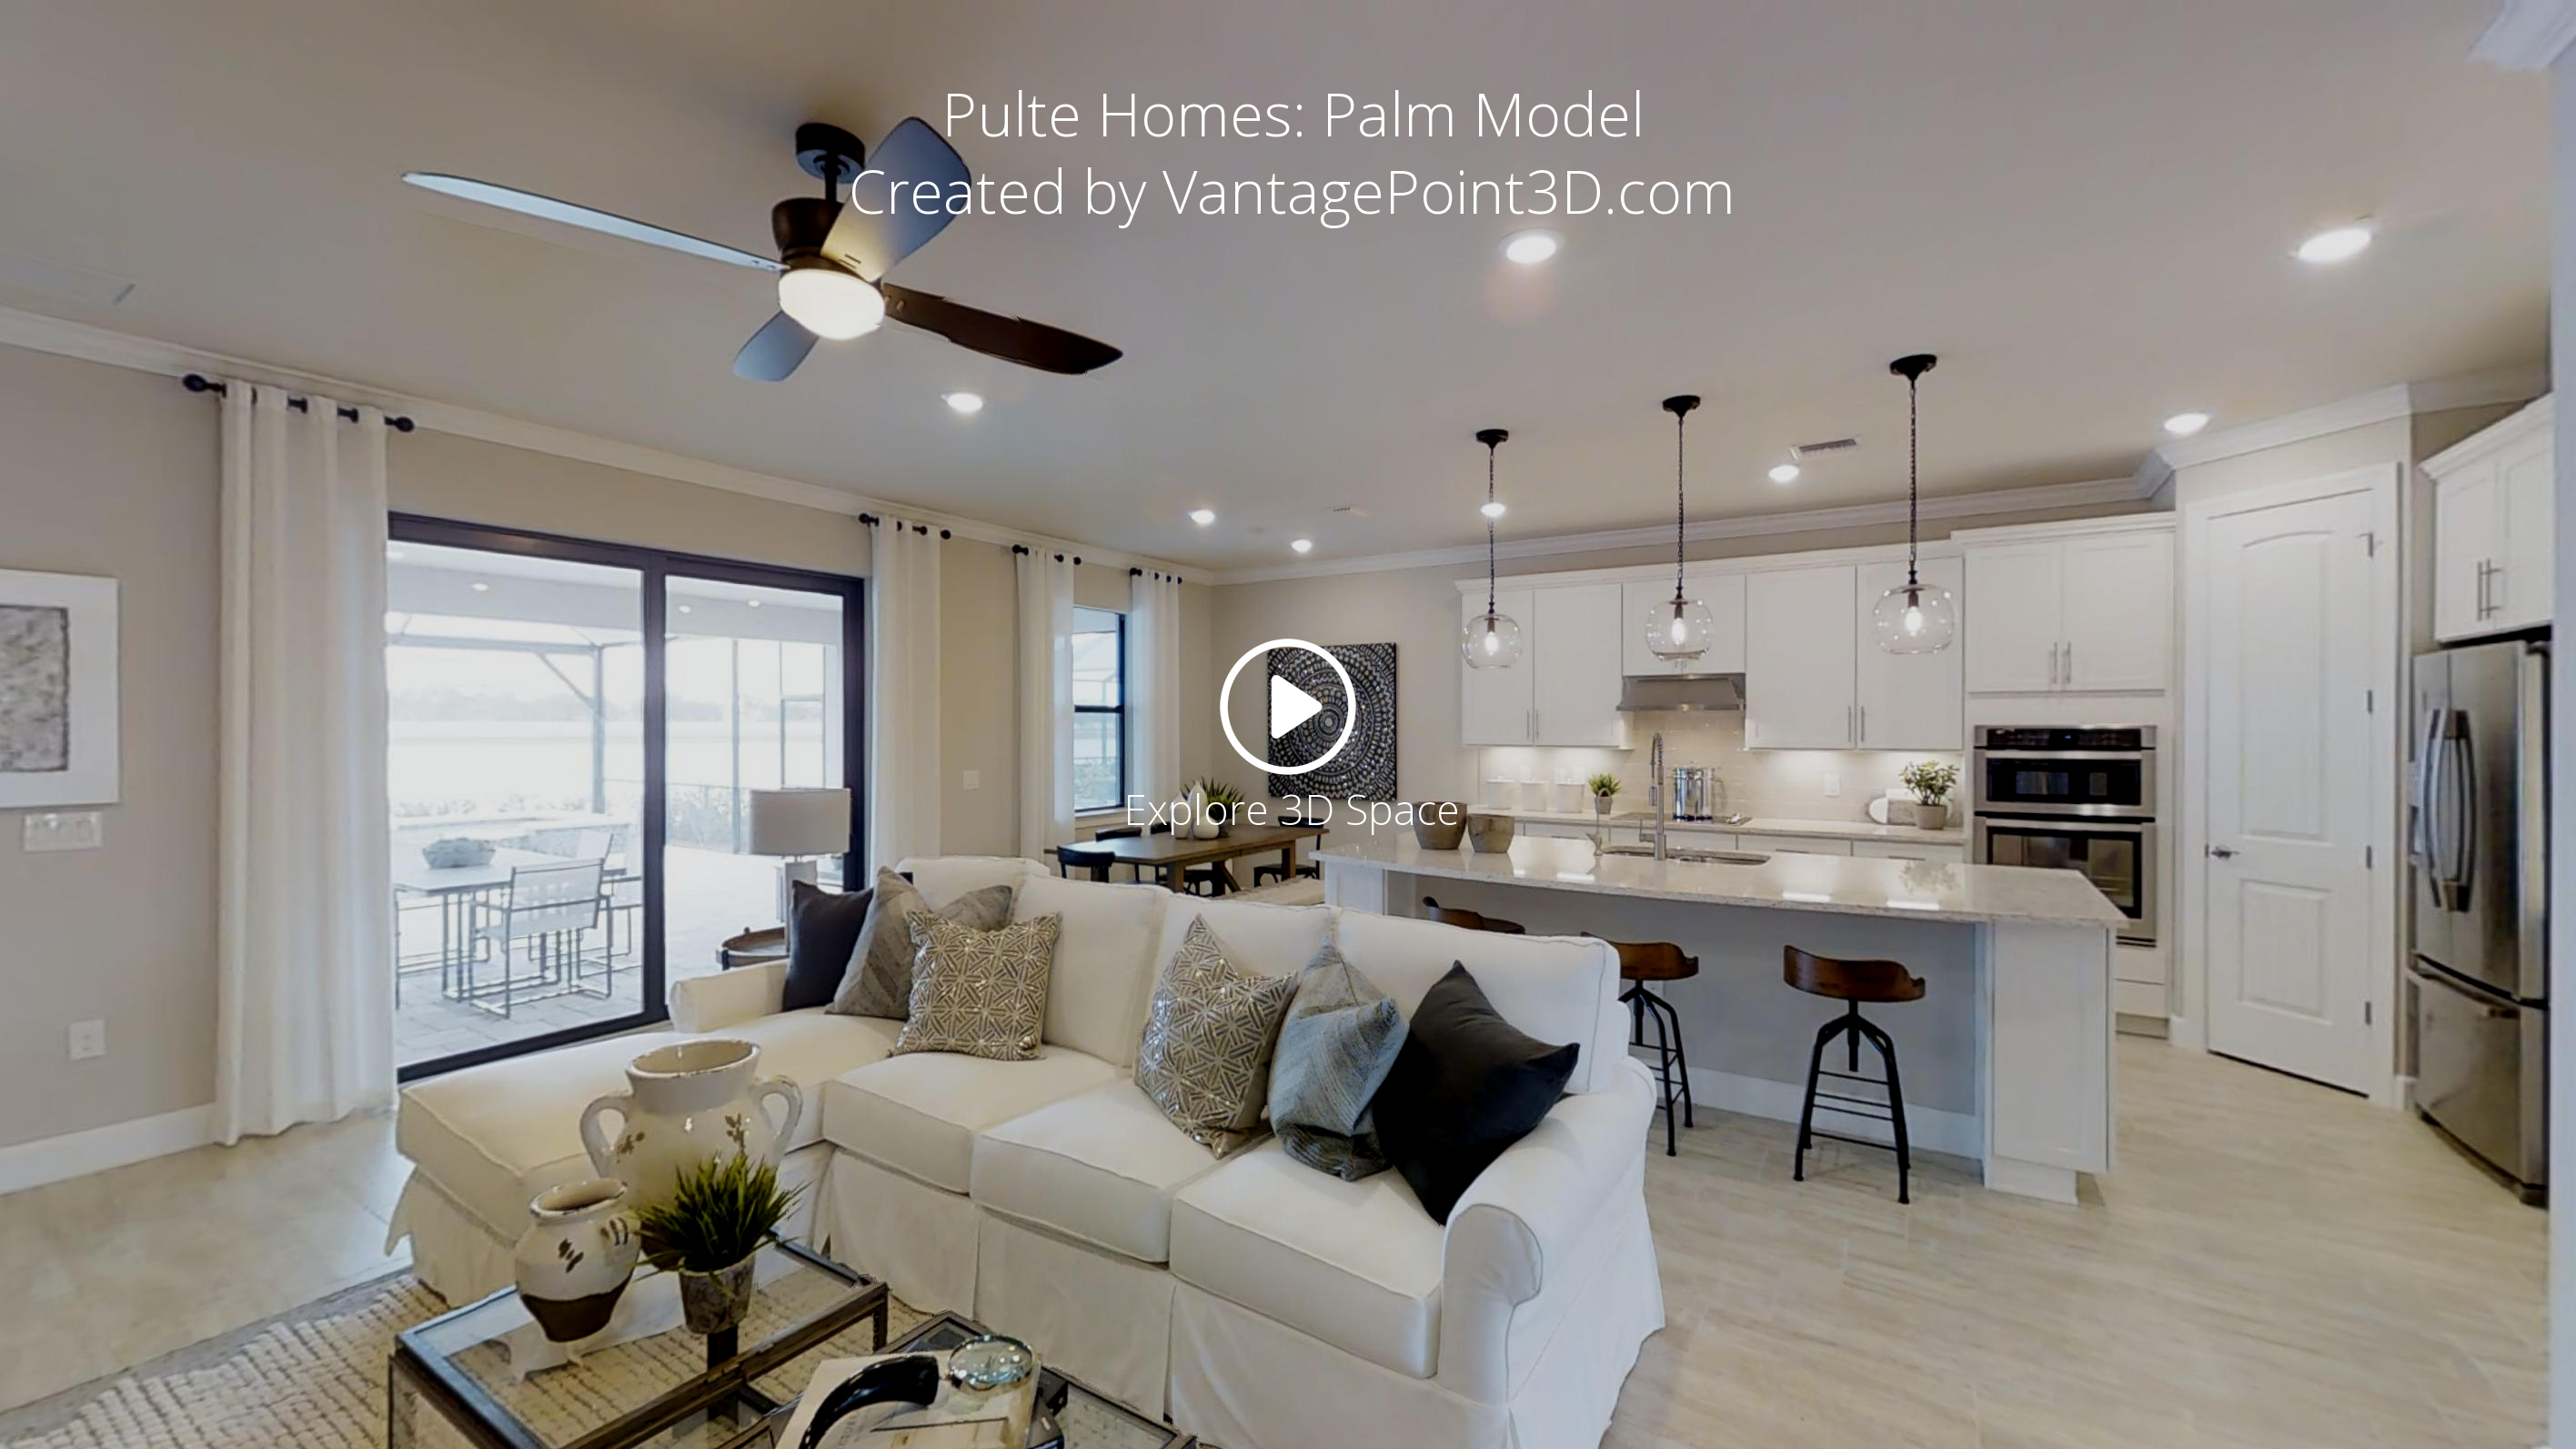 Pulte Homes Palm Model Vantagepoint 3d